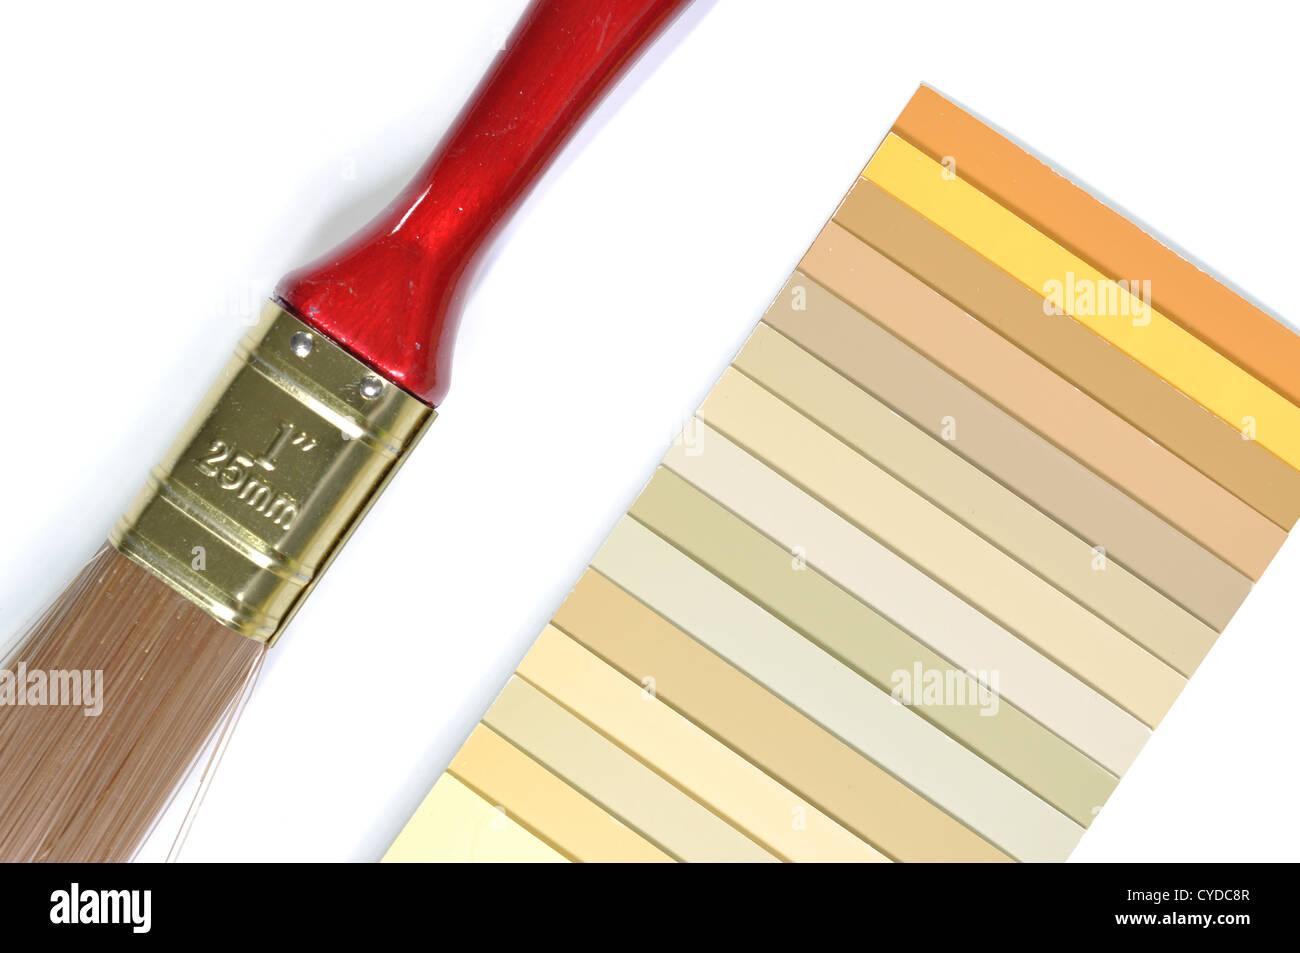 Pantone Colors Stockfotos & Pantone Colors Bilder - Alamy